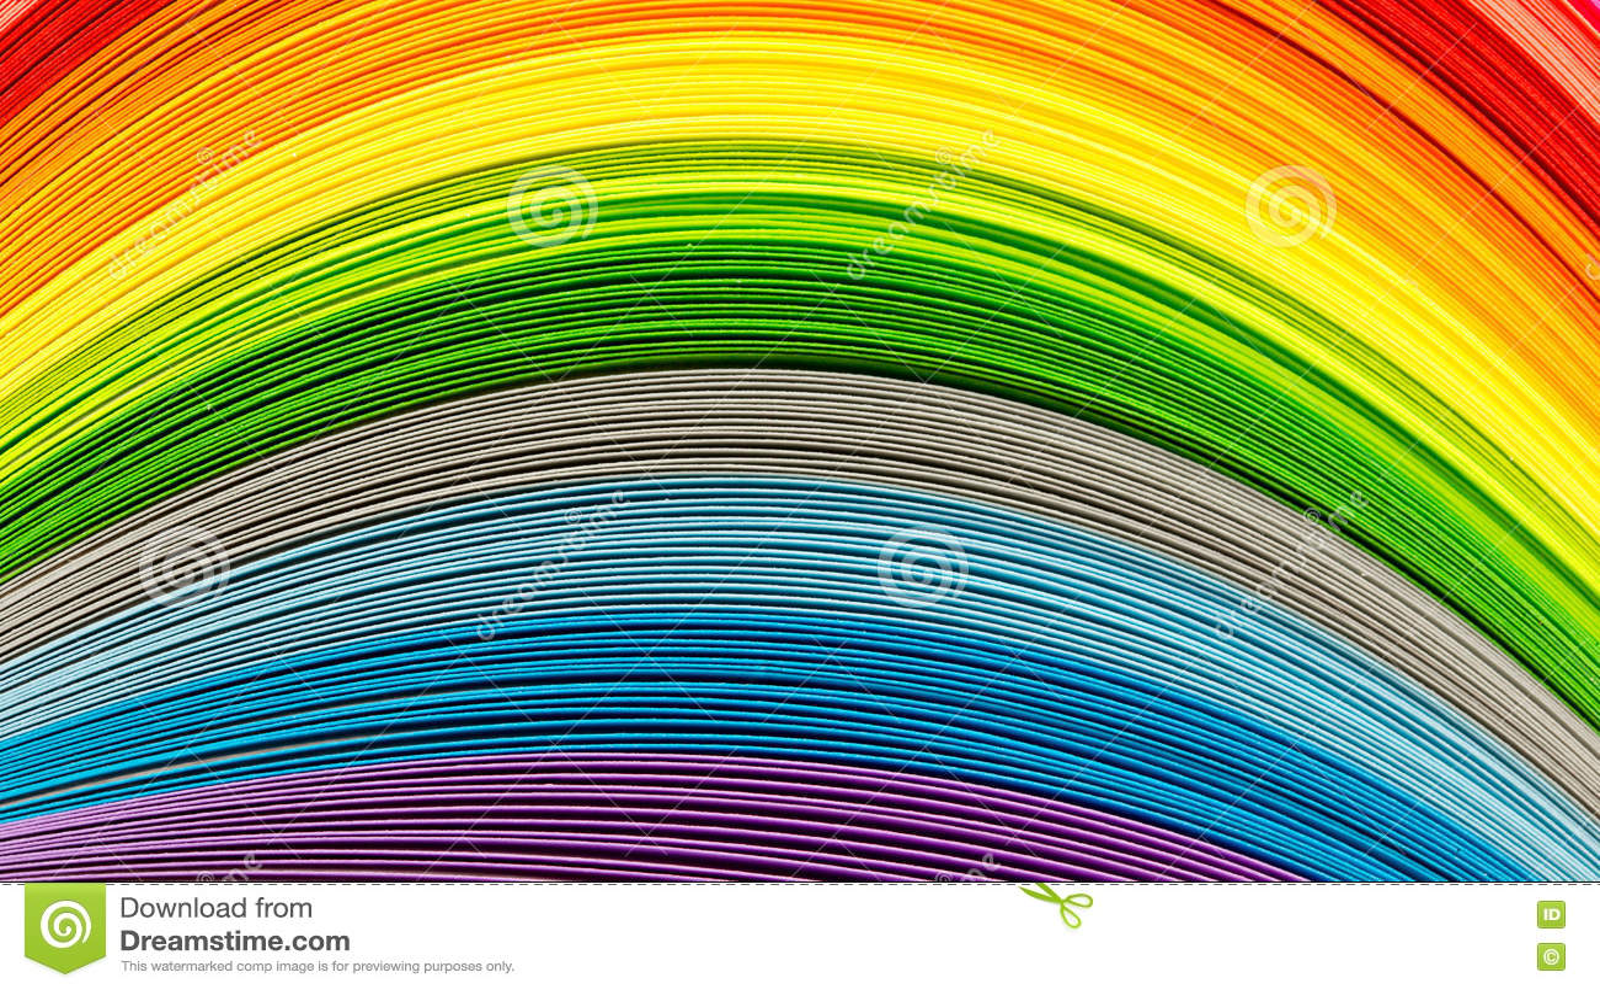 Tiras de papel en colores del arco iris